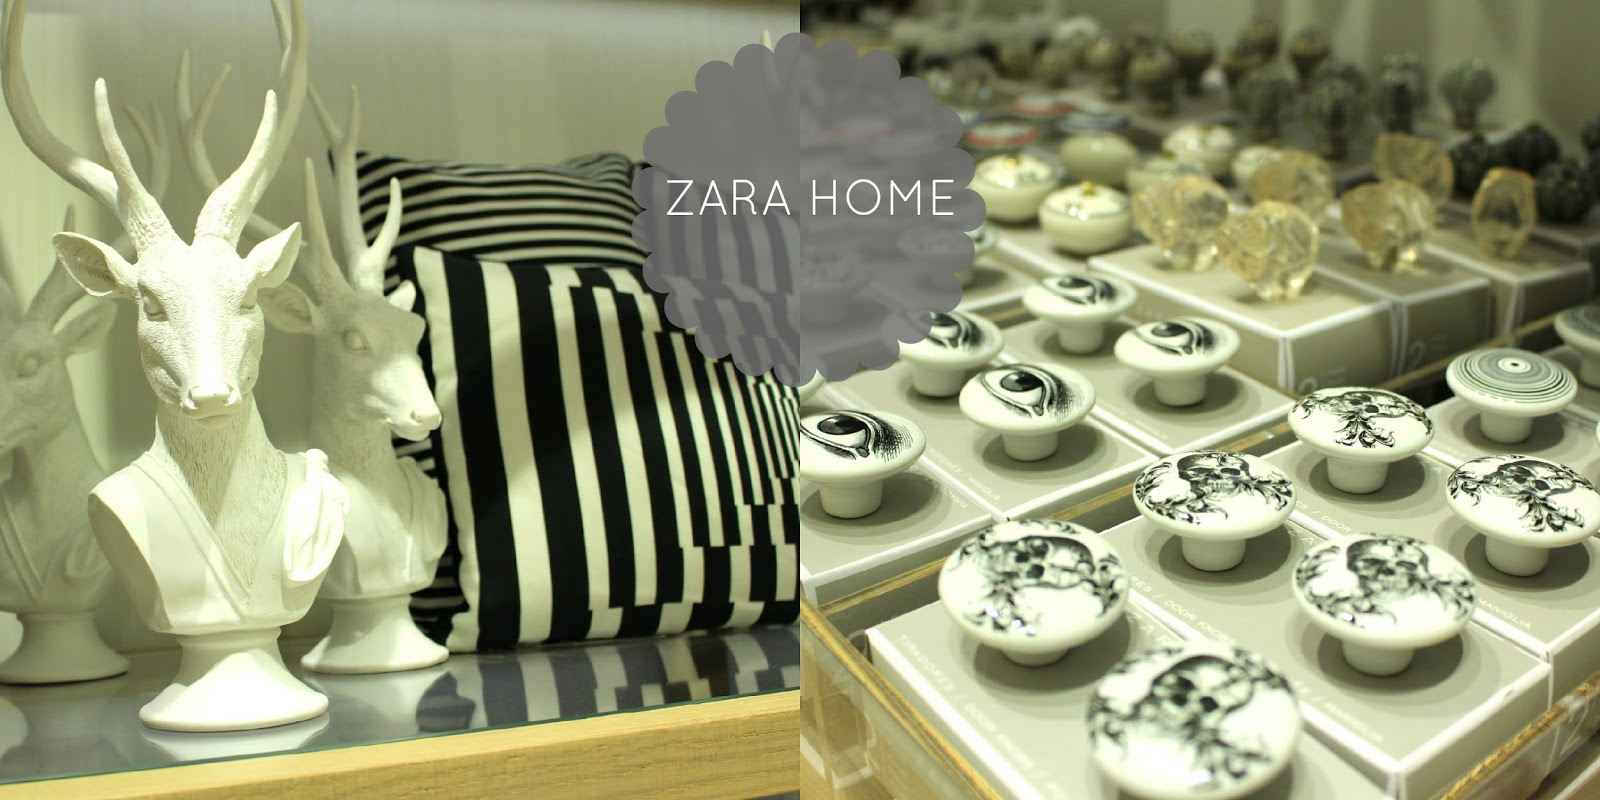 Zara home to open in toronto - Zara Home Has Officially Opened In Canada Decor